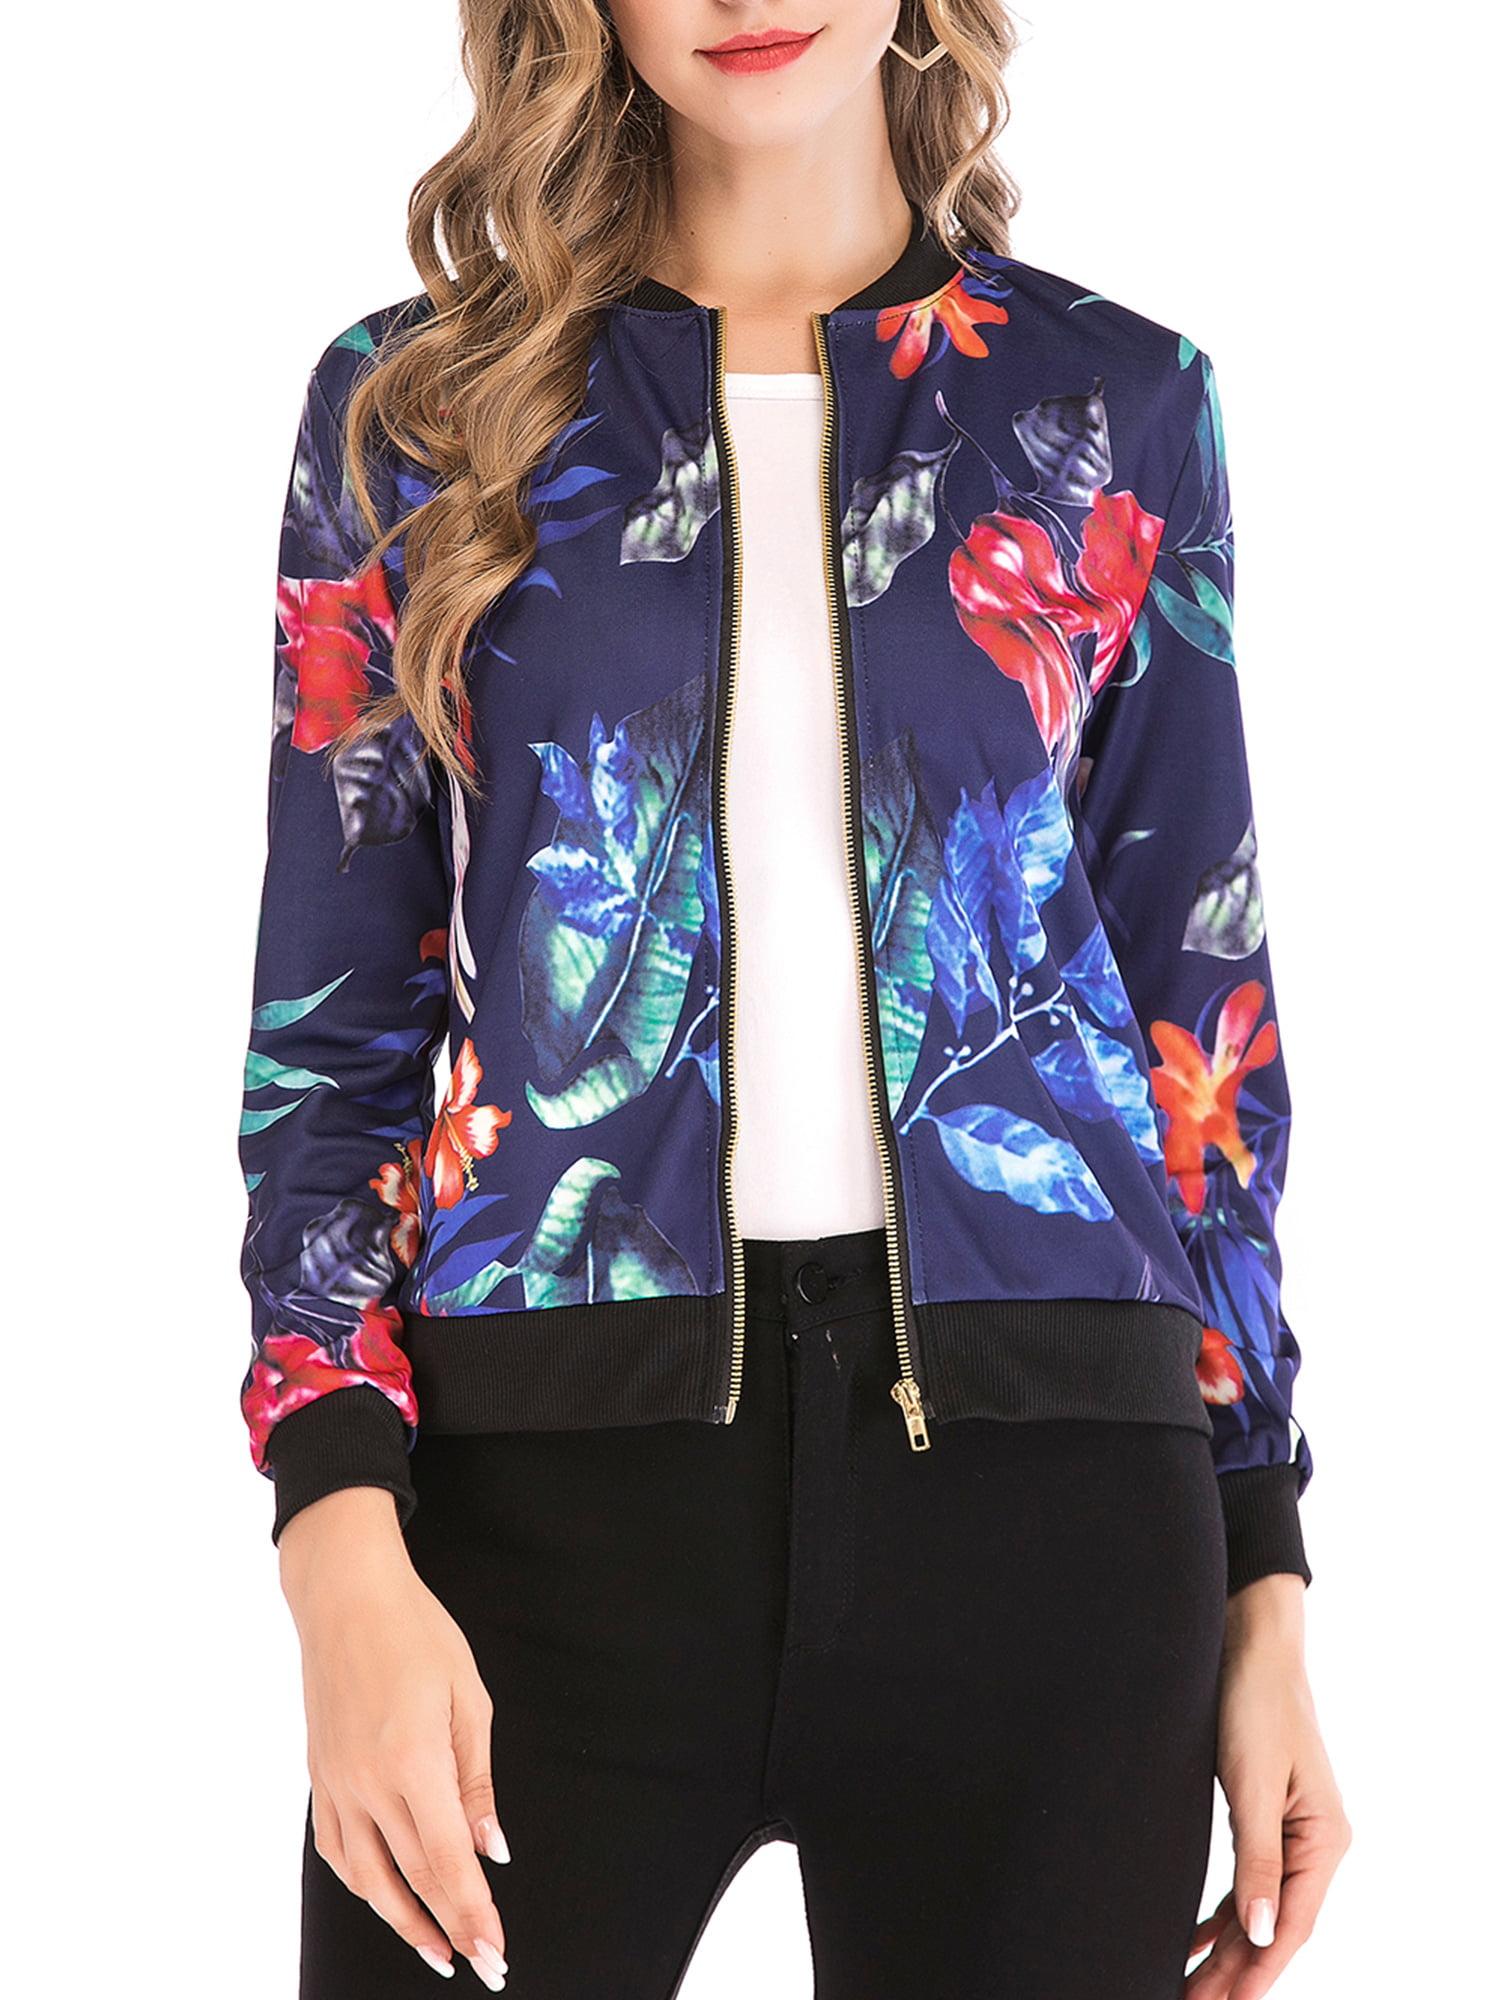 Womens Retro Floral Print Zipper Up Thin Jacket Casual Coat